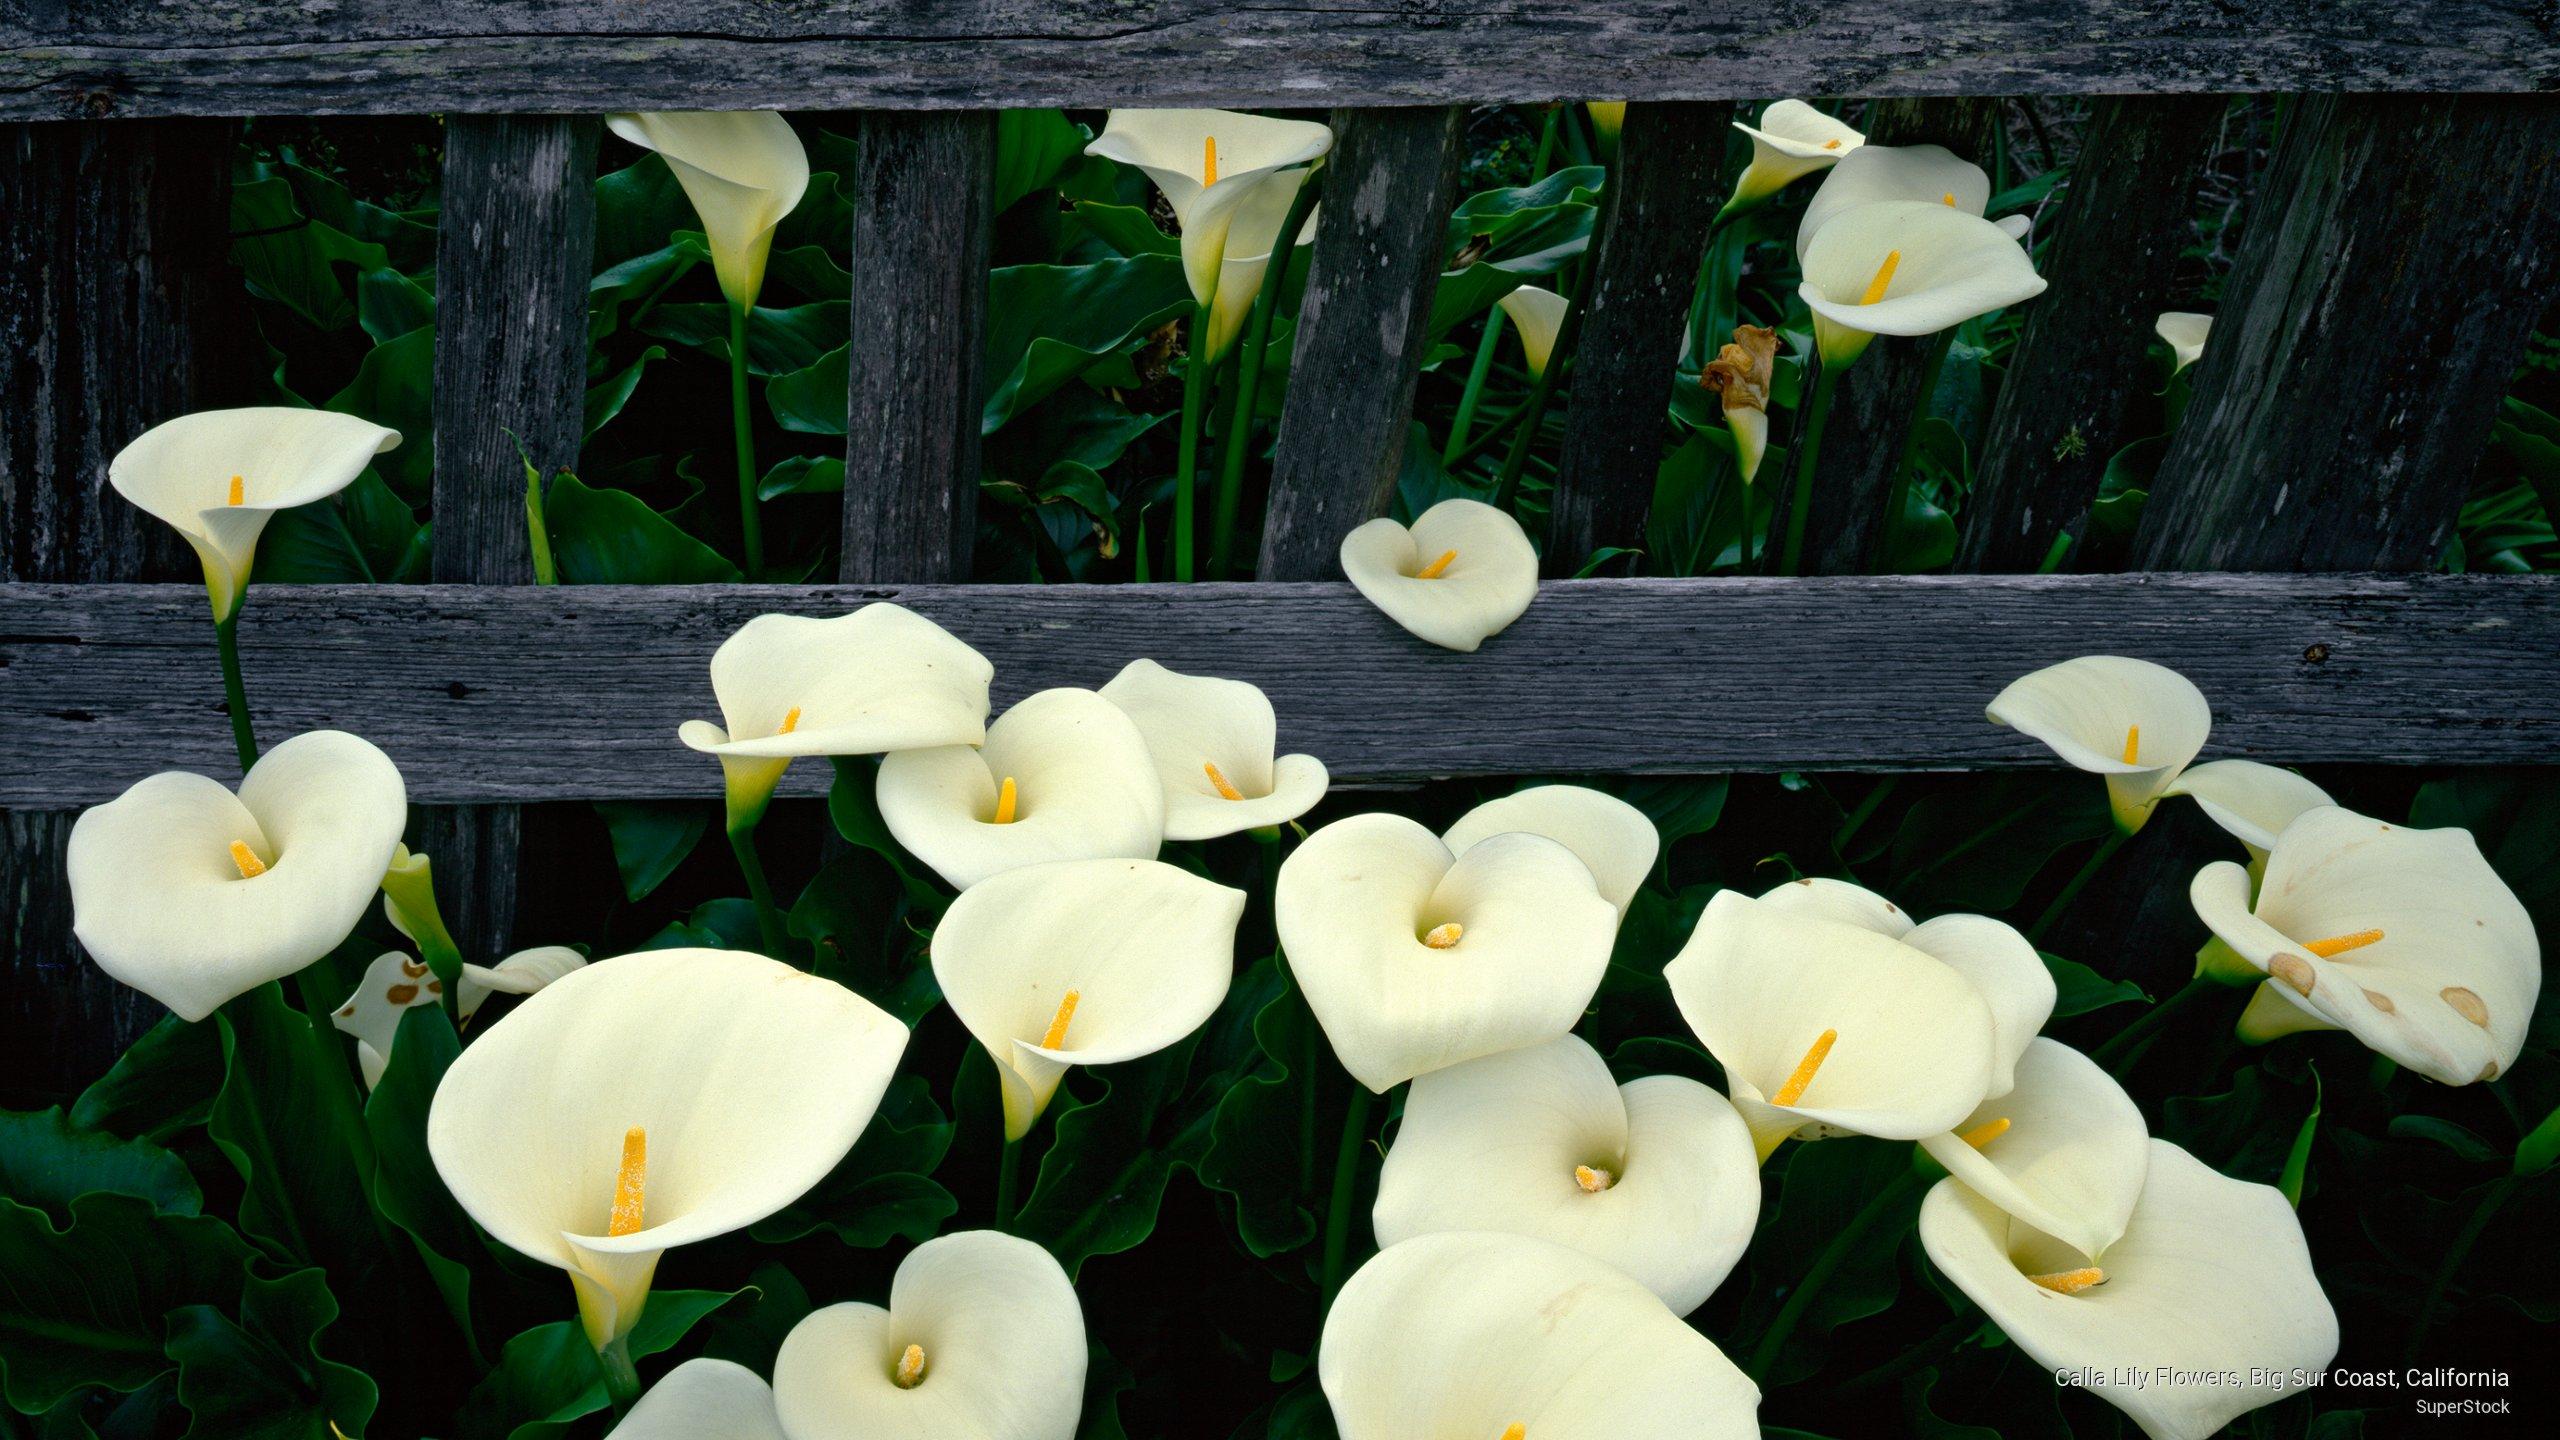 Calla Lily Flowers, Big Sur Coast, California